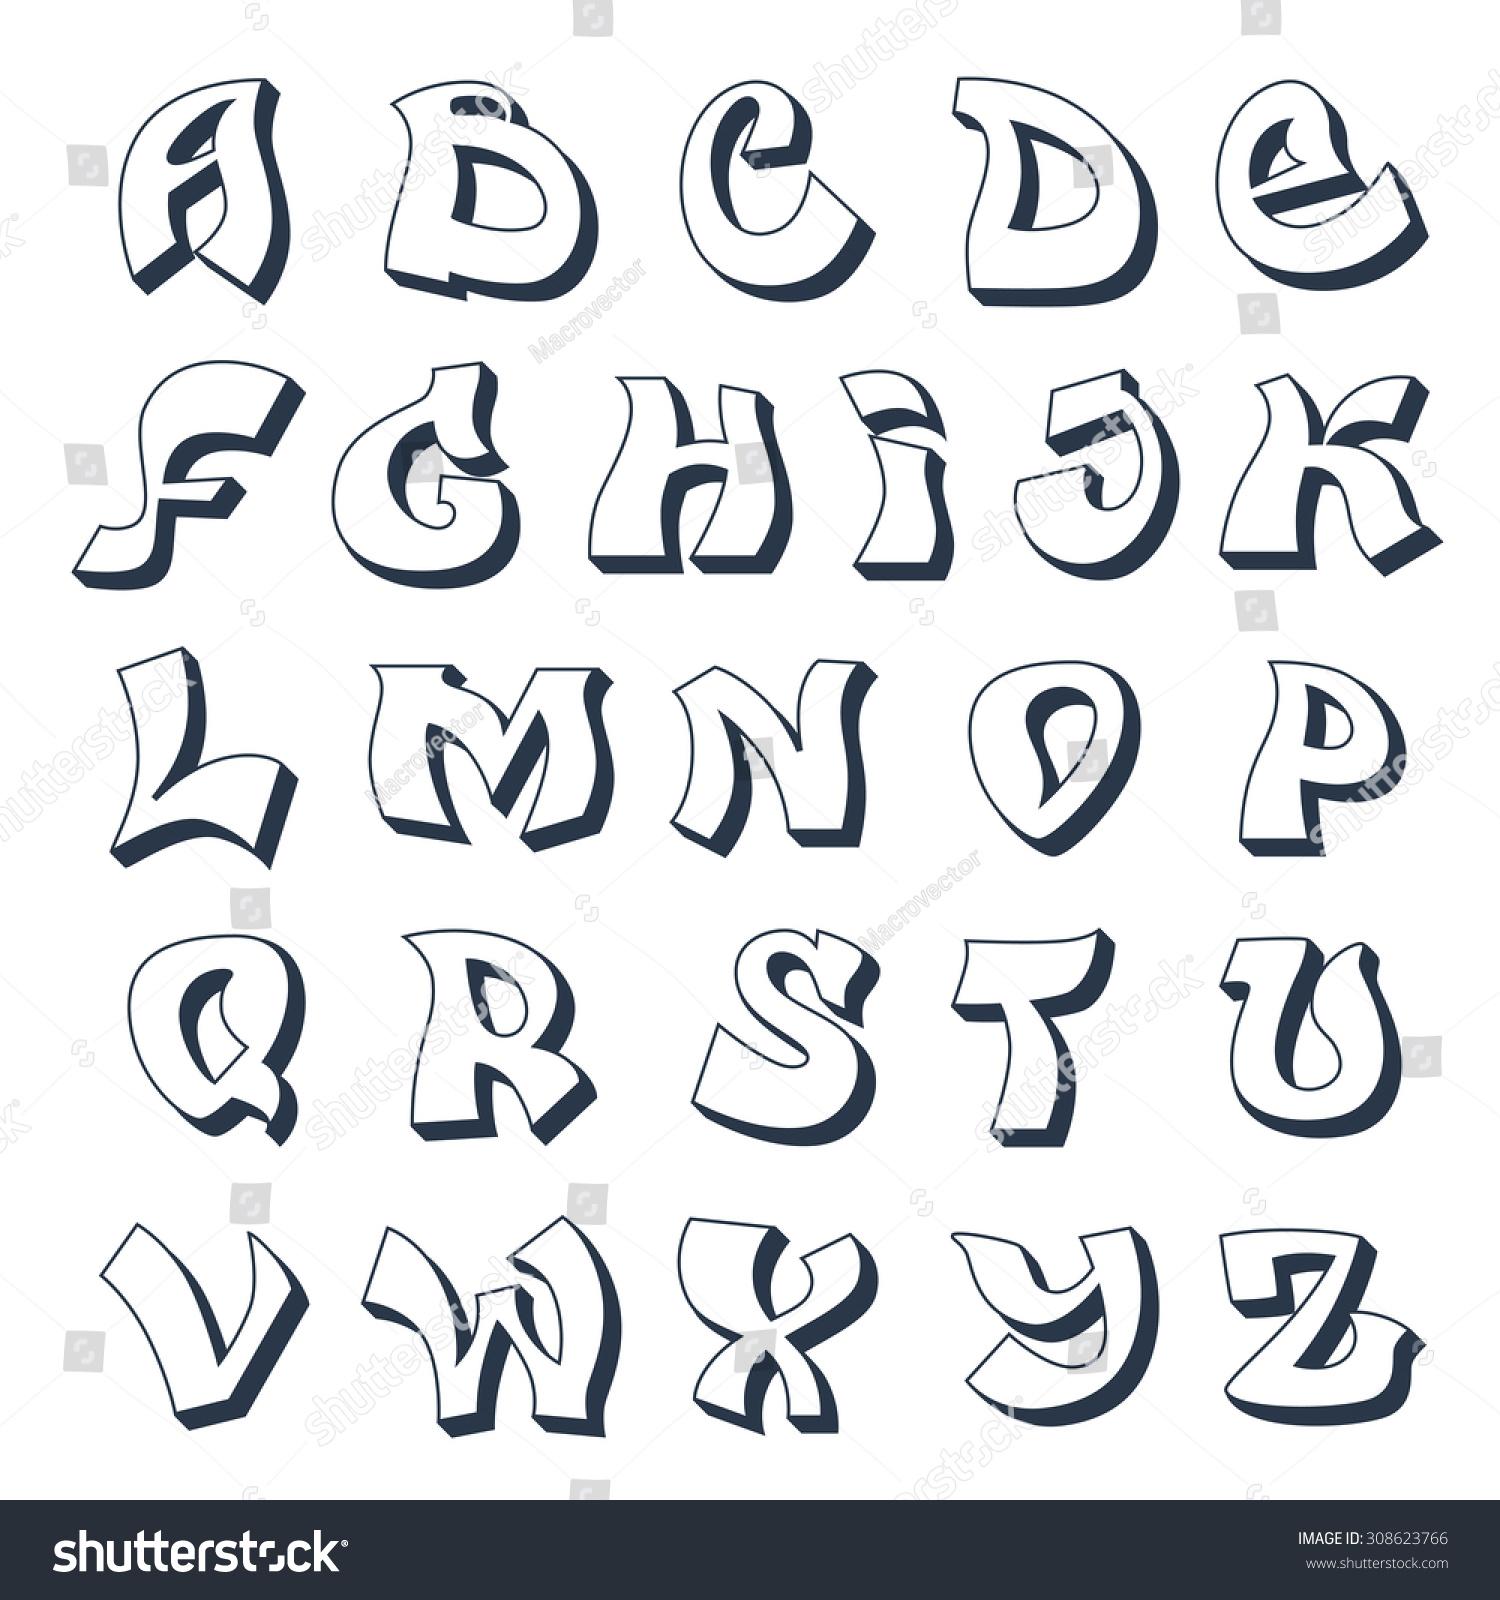 Graffiti alphabet cool street style font design white illustration